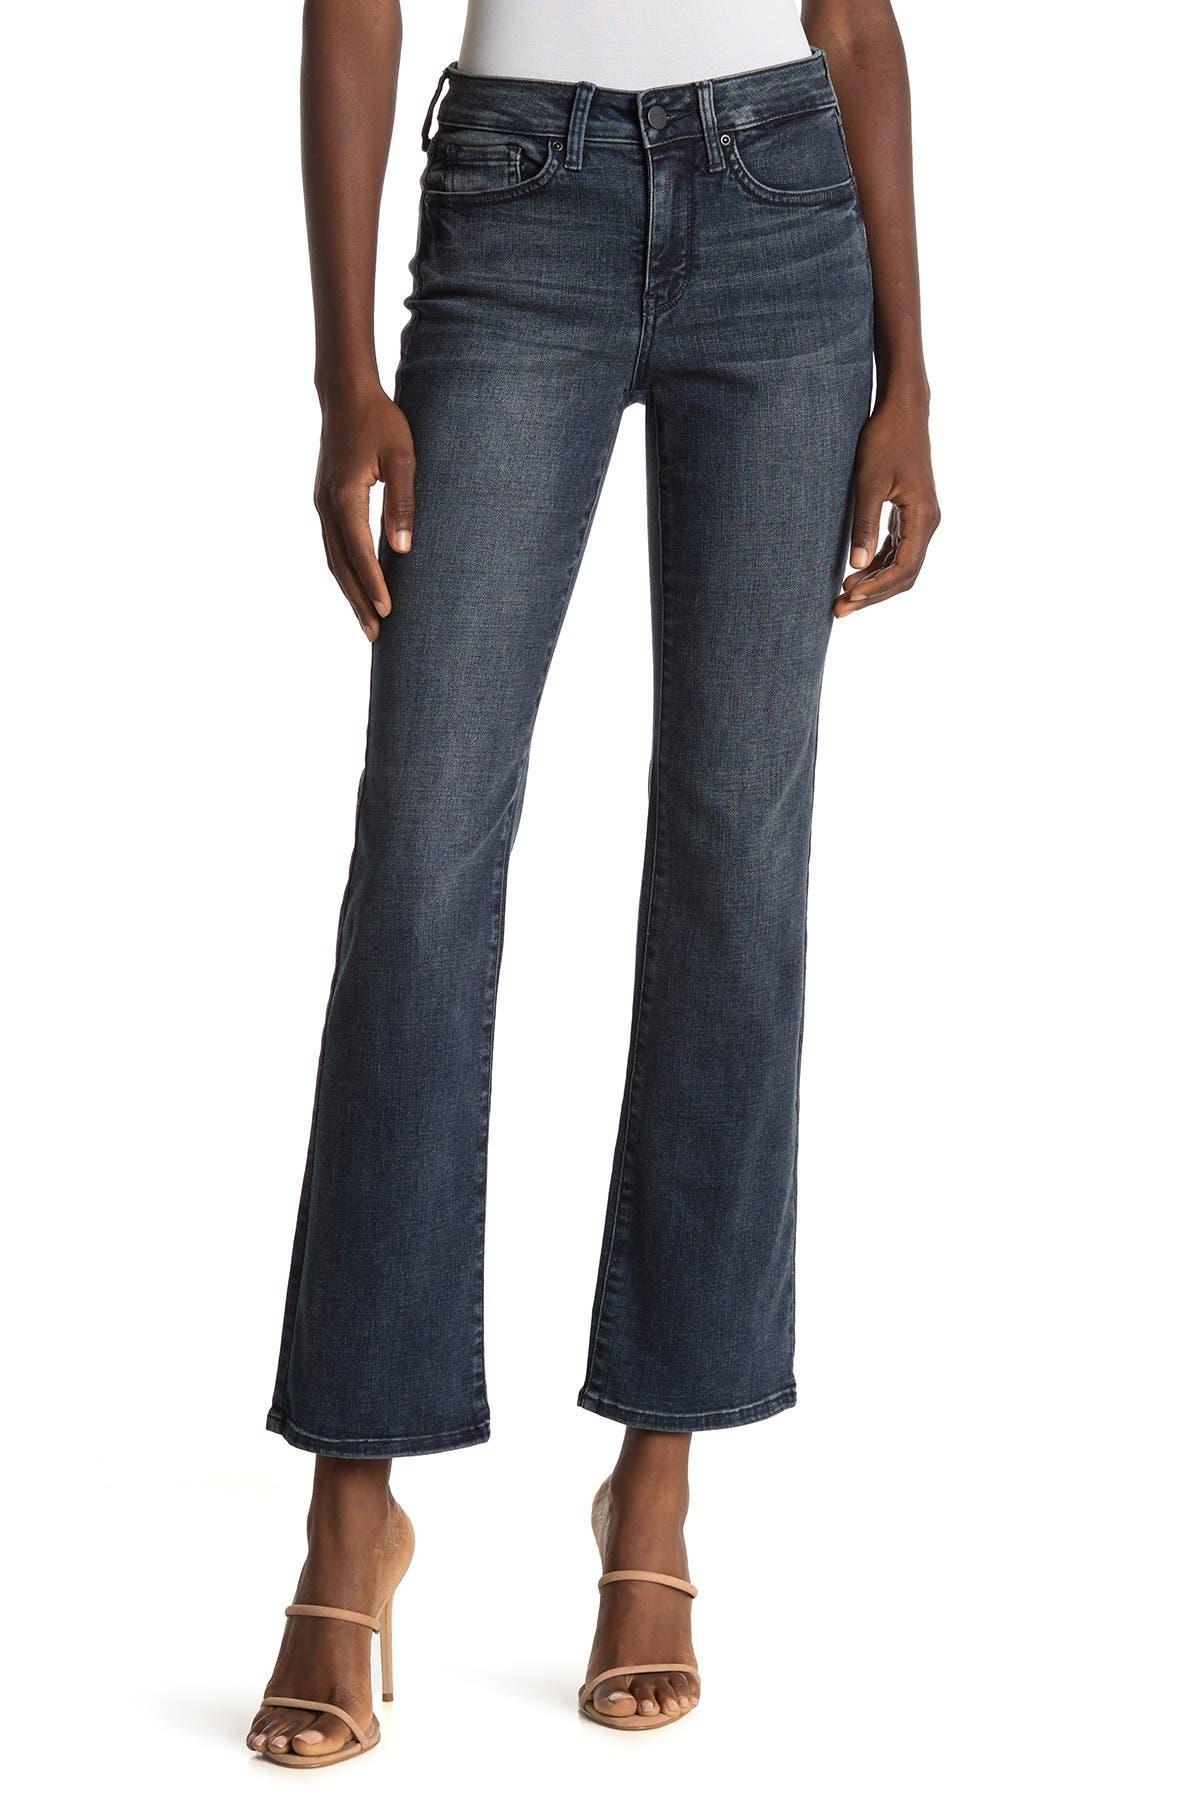 Image of NYDJ Barbara Bootcut Jeans